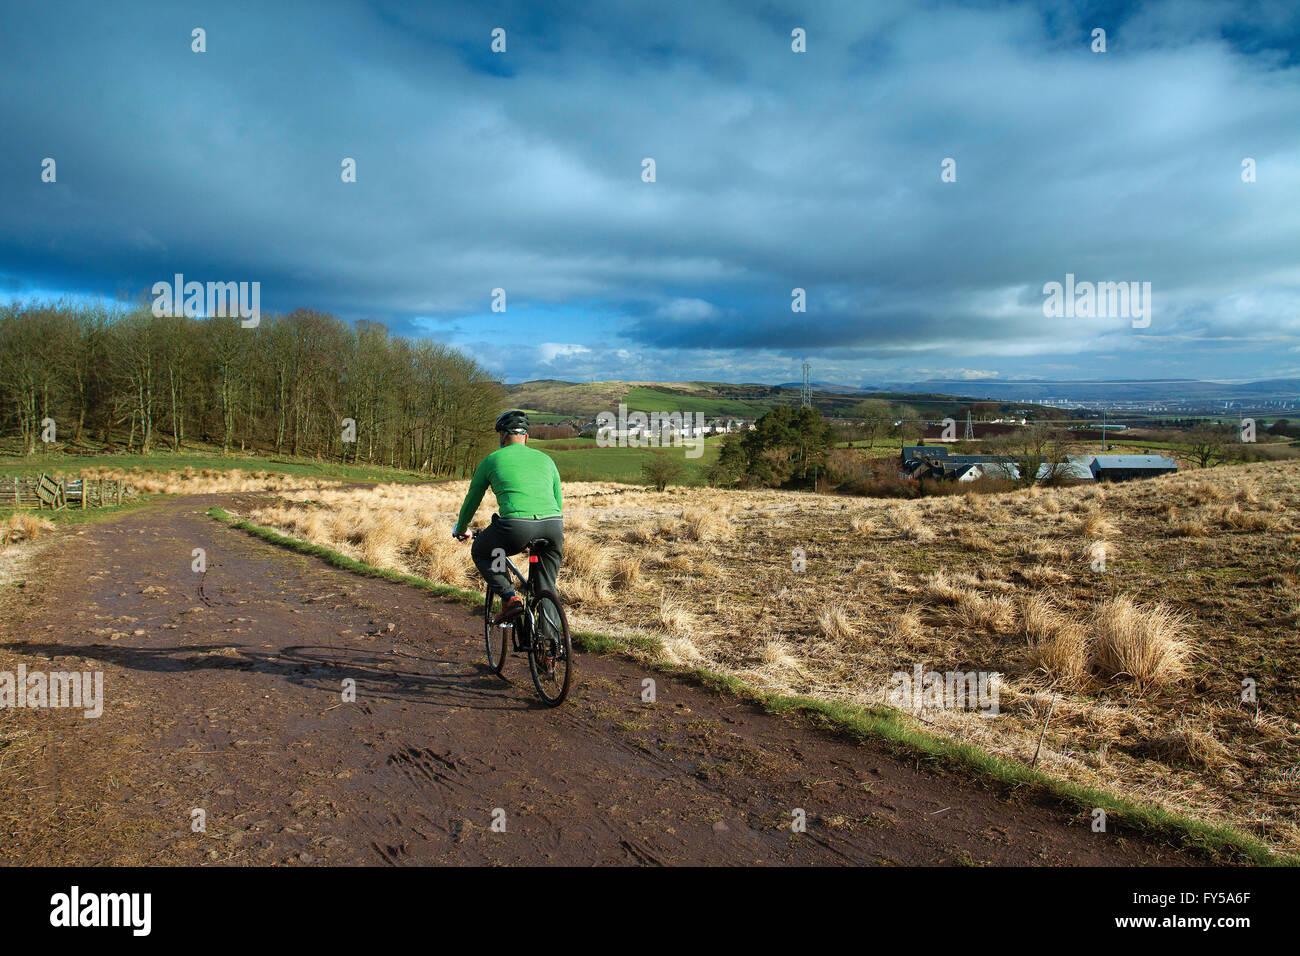 Un ciclista in bicicletta intorno Neilston Pad, Neilston, East Renfrewshire Immagini Stock